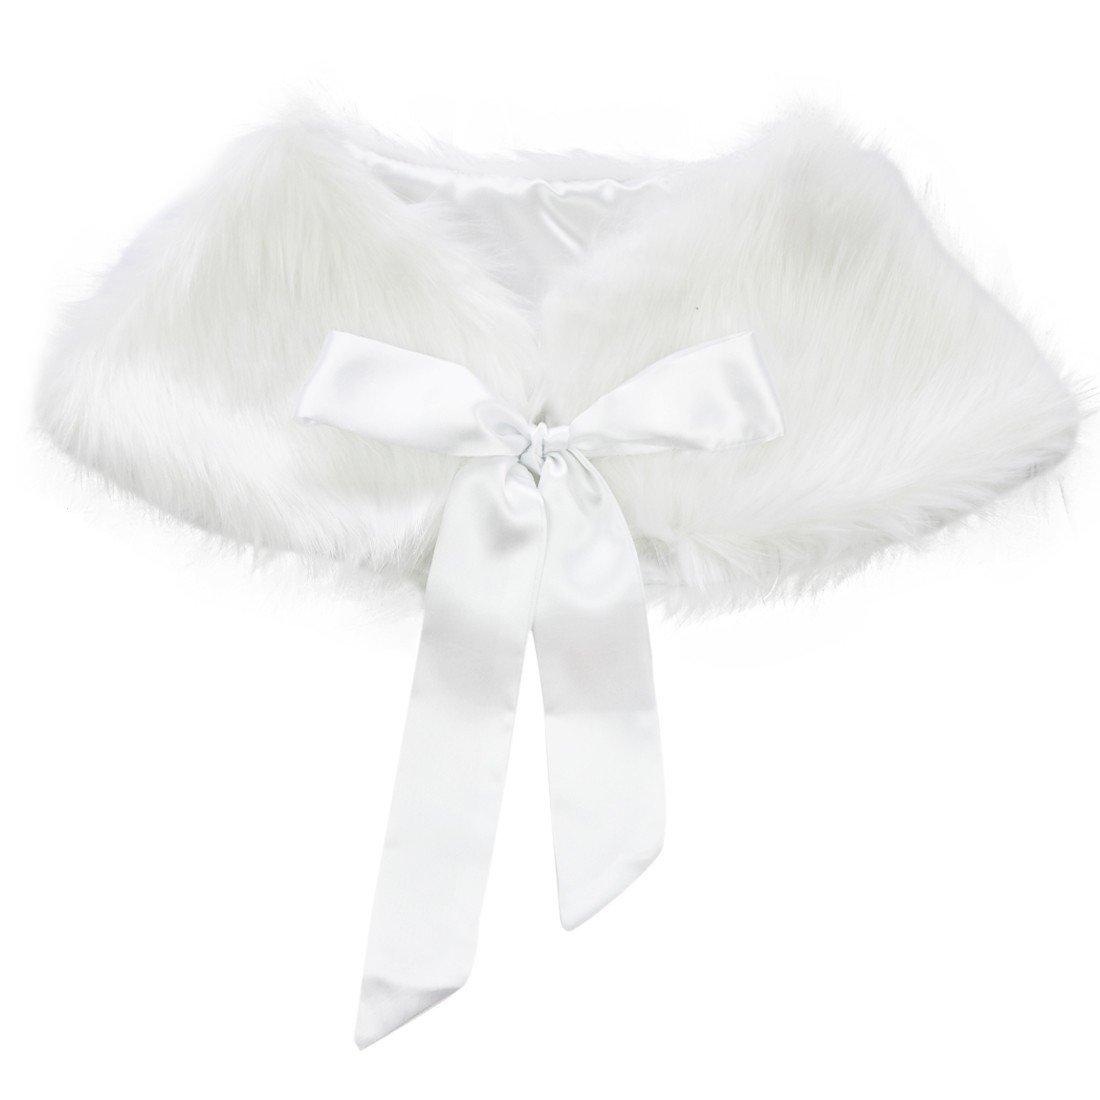 Freebily Flower Girls Faux Fur Wraps Princess Shoulder Cape Kids First Communion Wedding Bridesmaid Dress Bolero Shrug White One Size